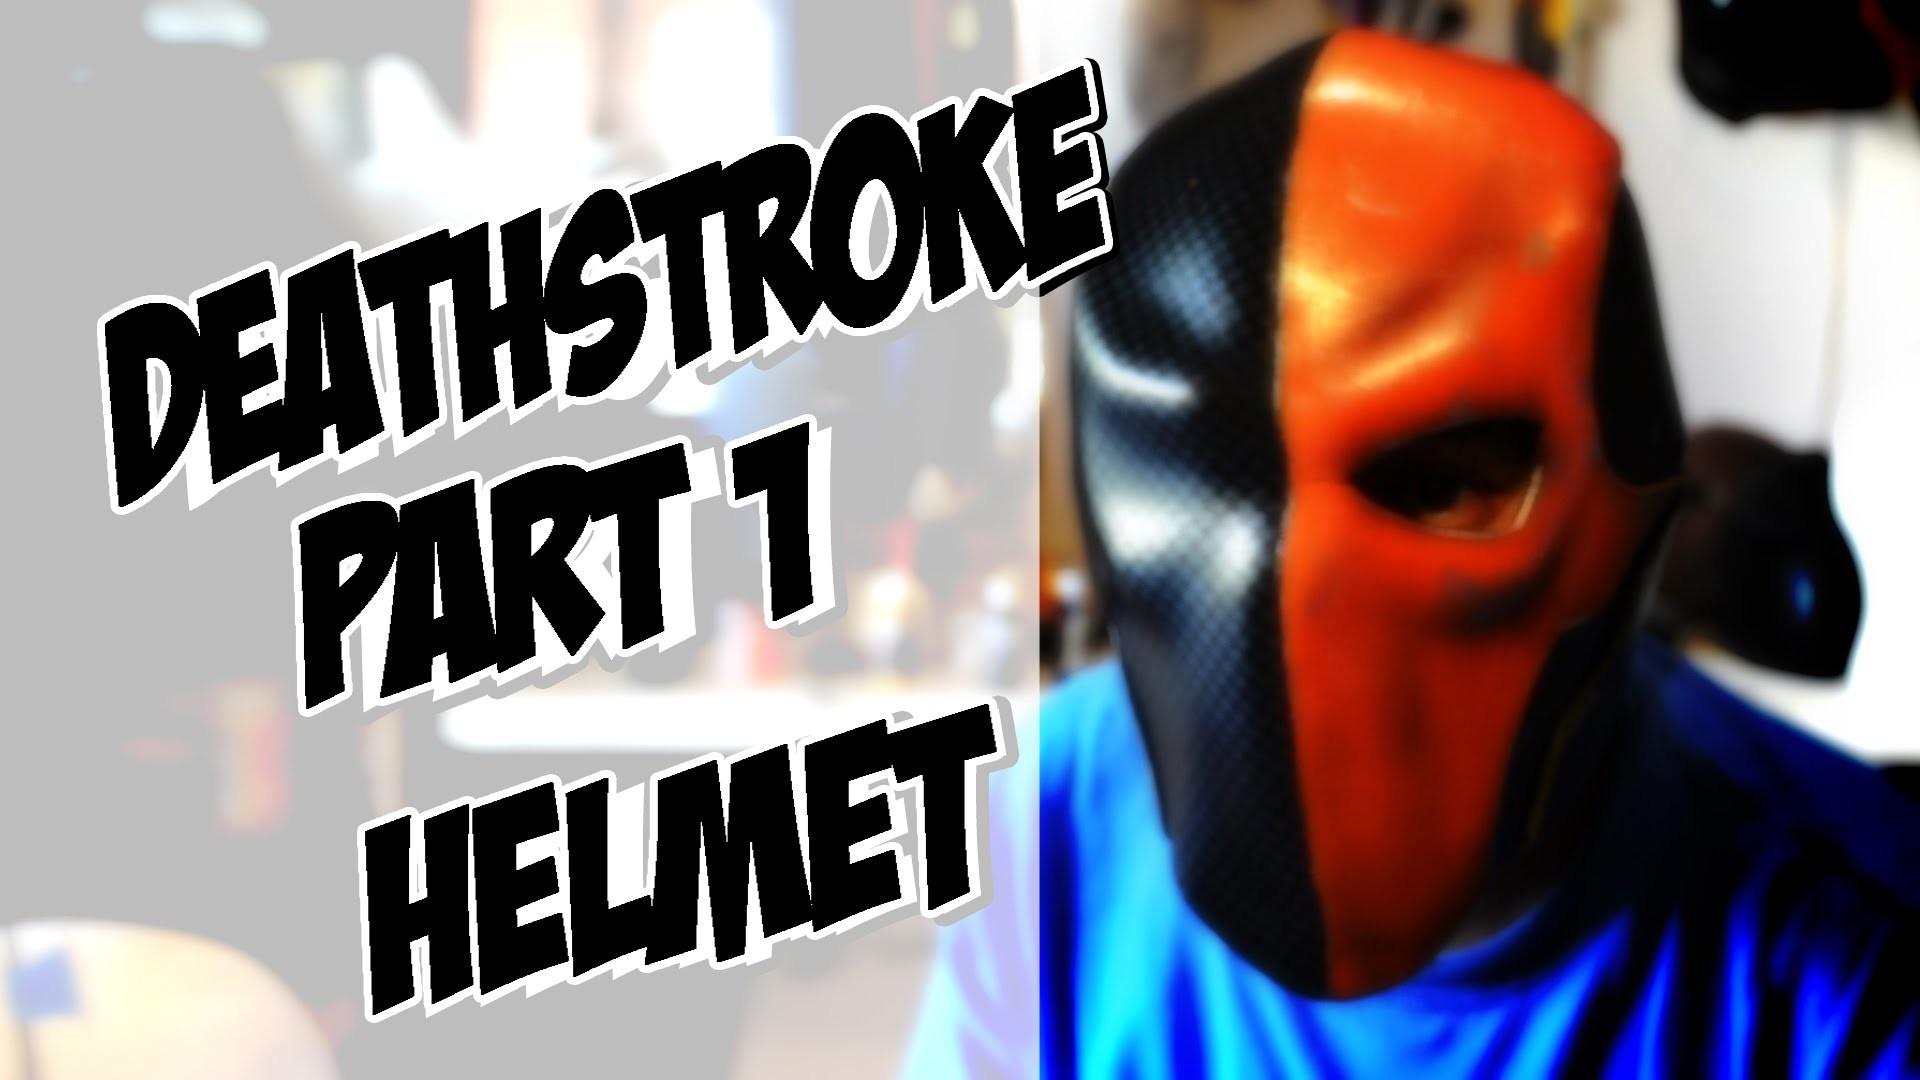 Deathstroke part 1 Helmet How to DIY com Cosplay costume Batman Arkham Knight